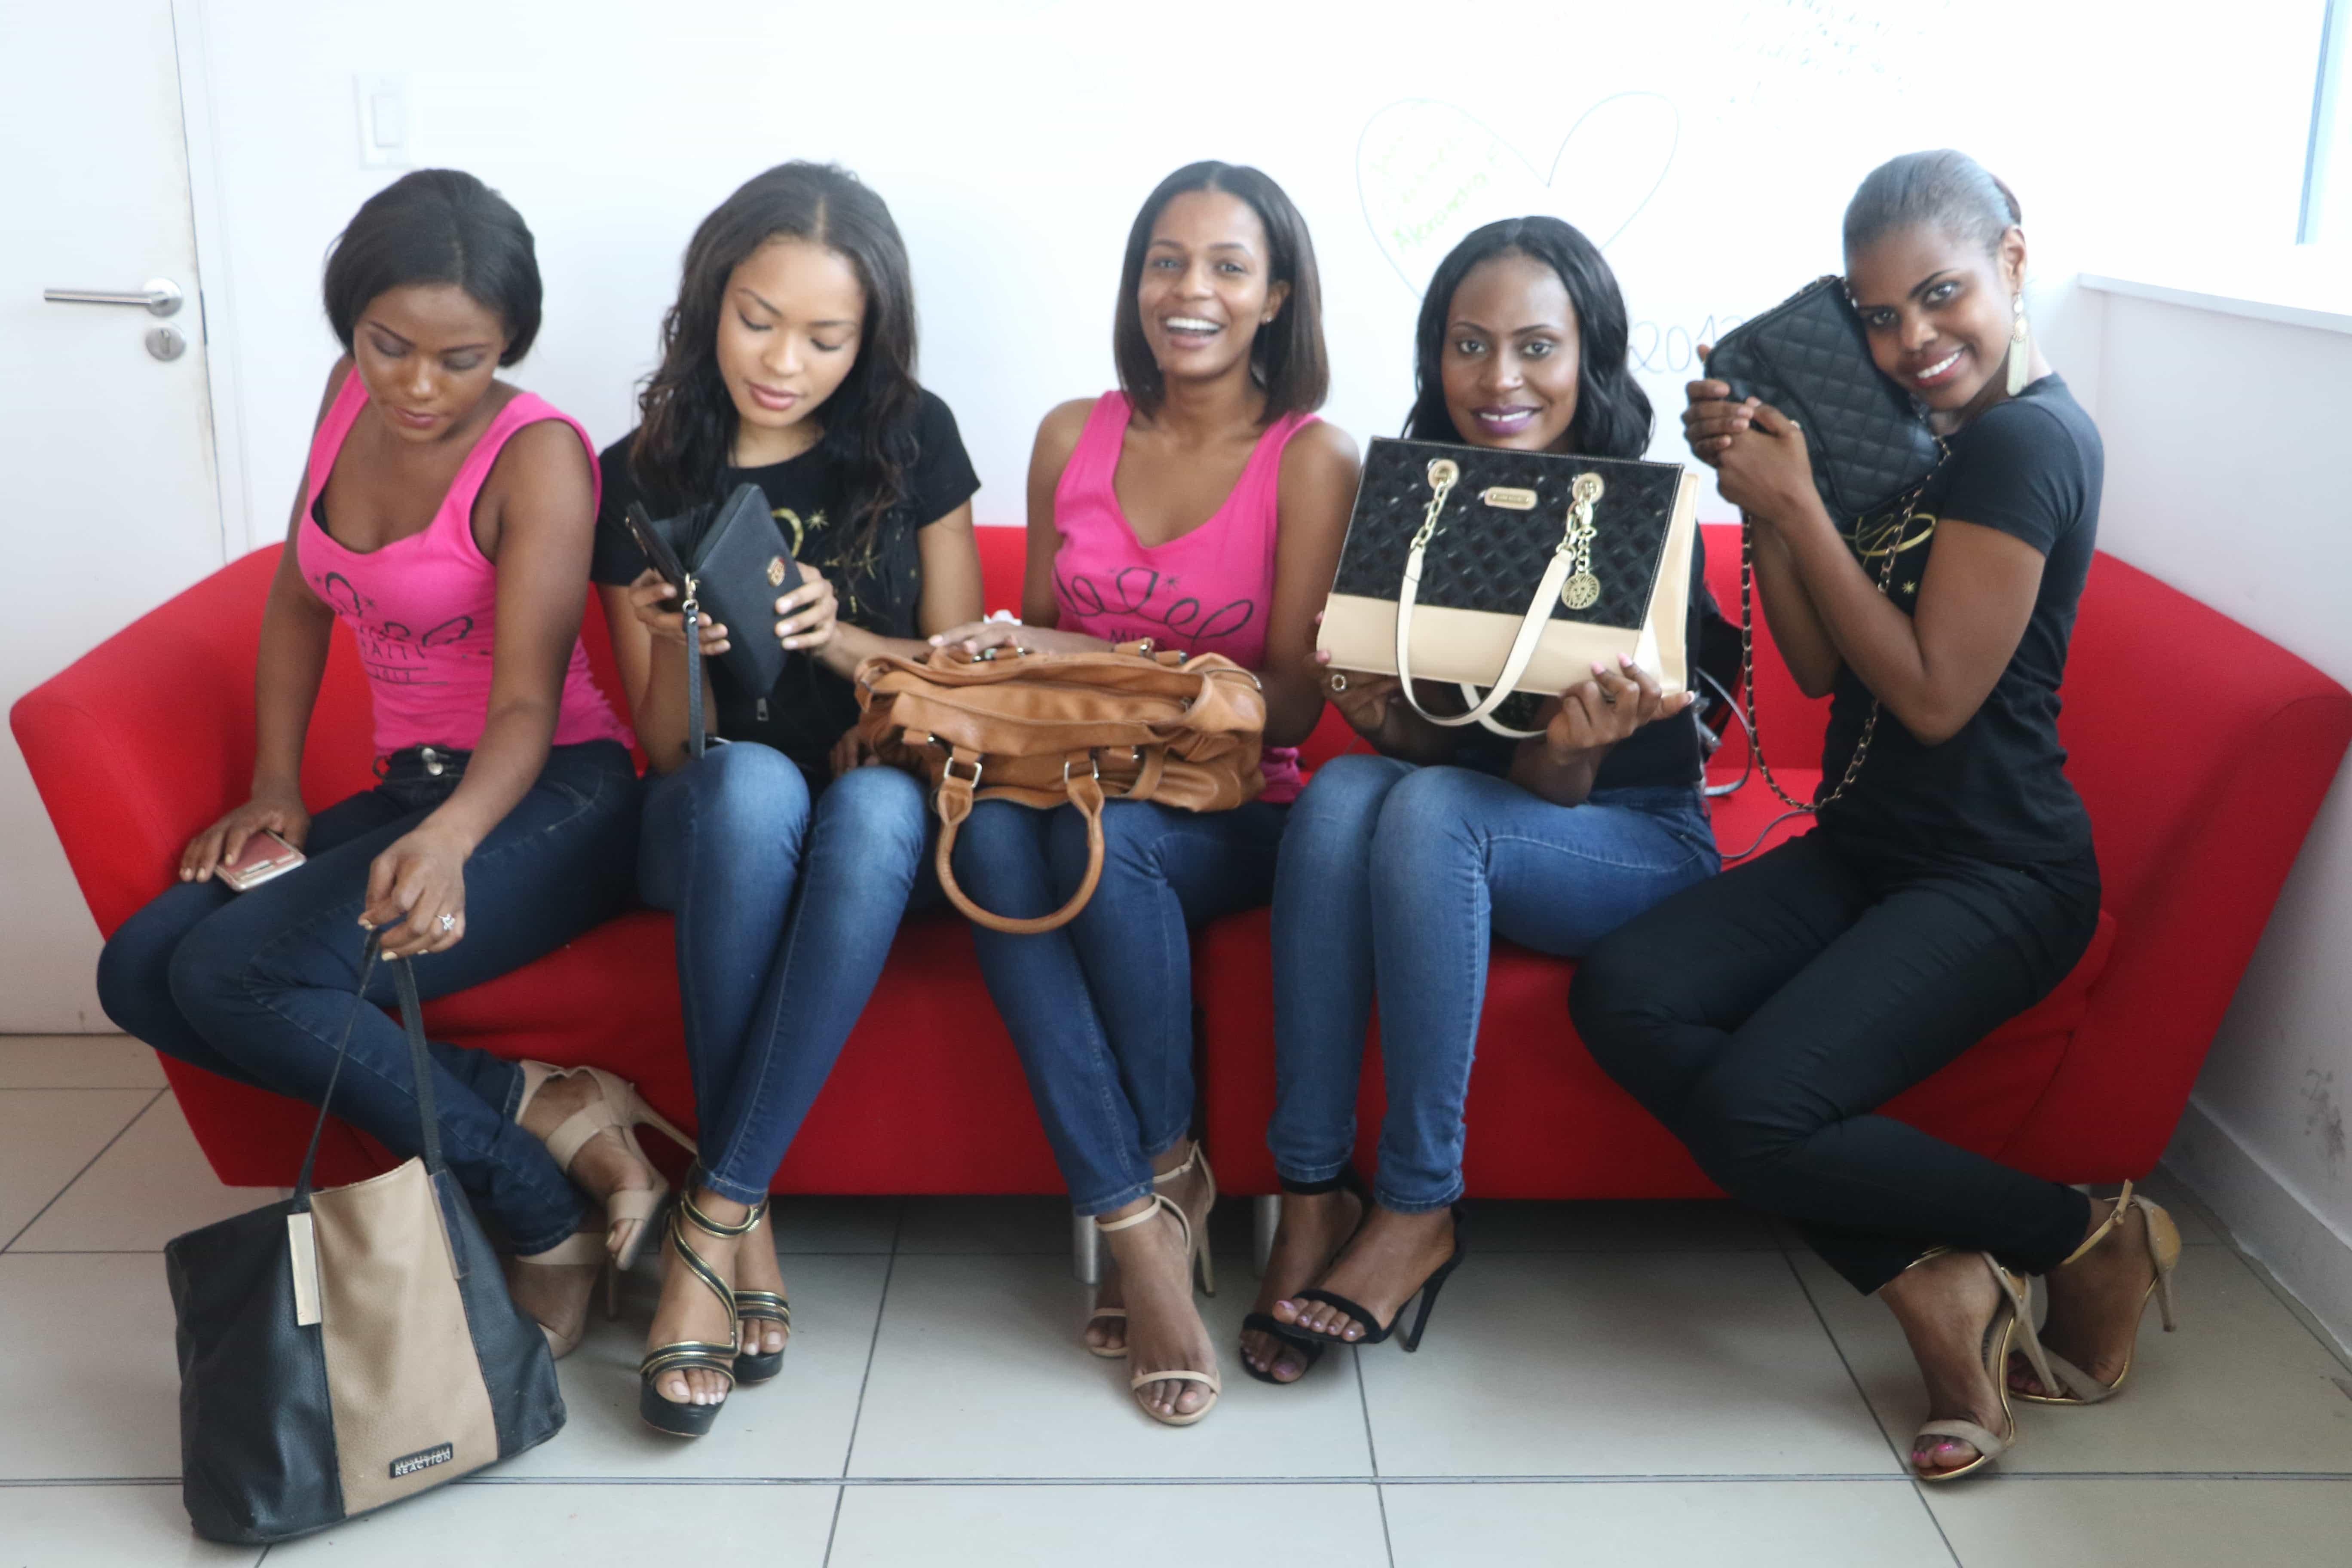 Cinq des candidates de Miss Haiti 2017